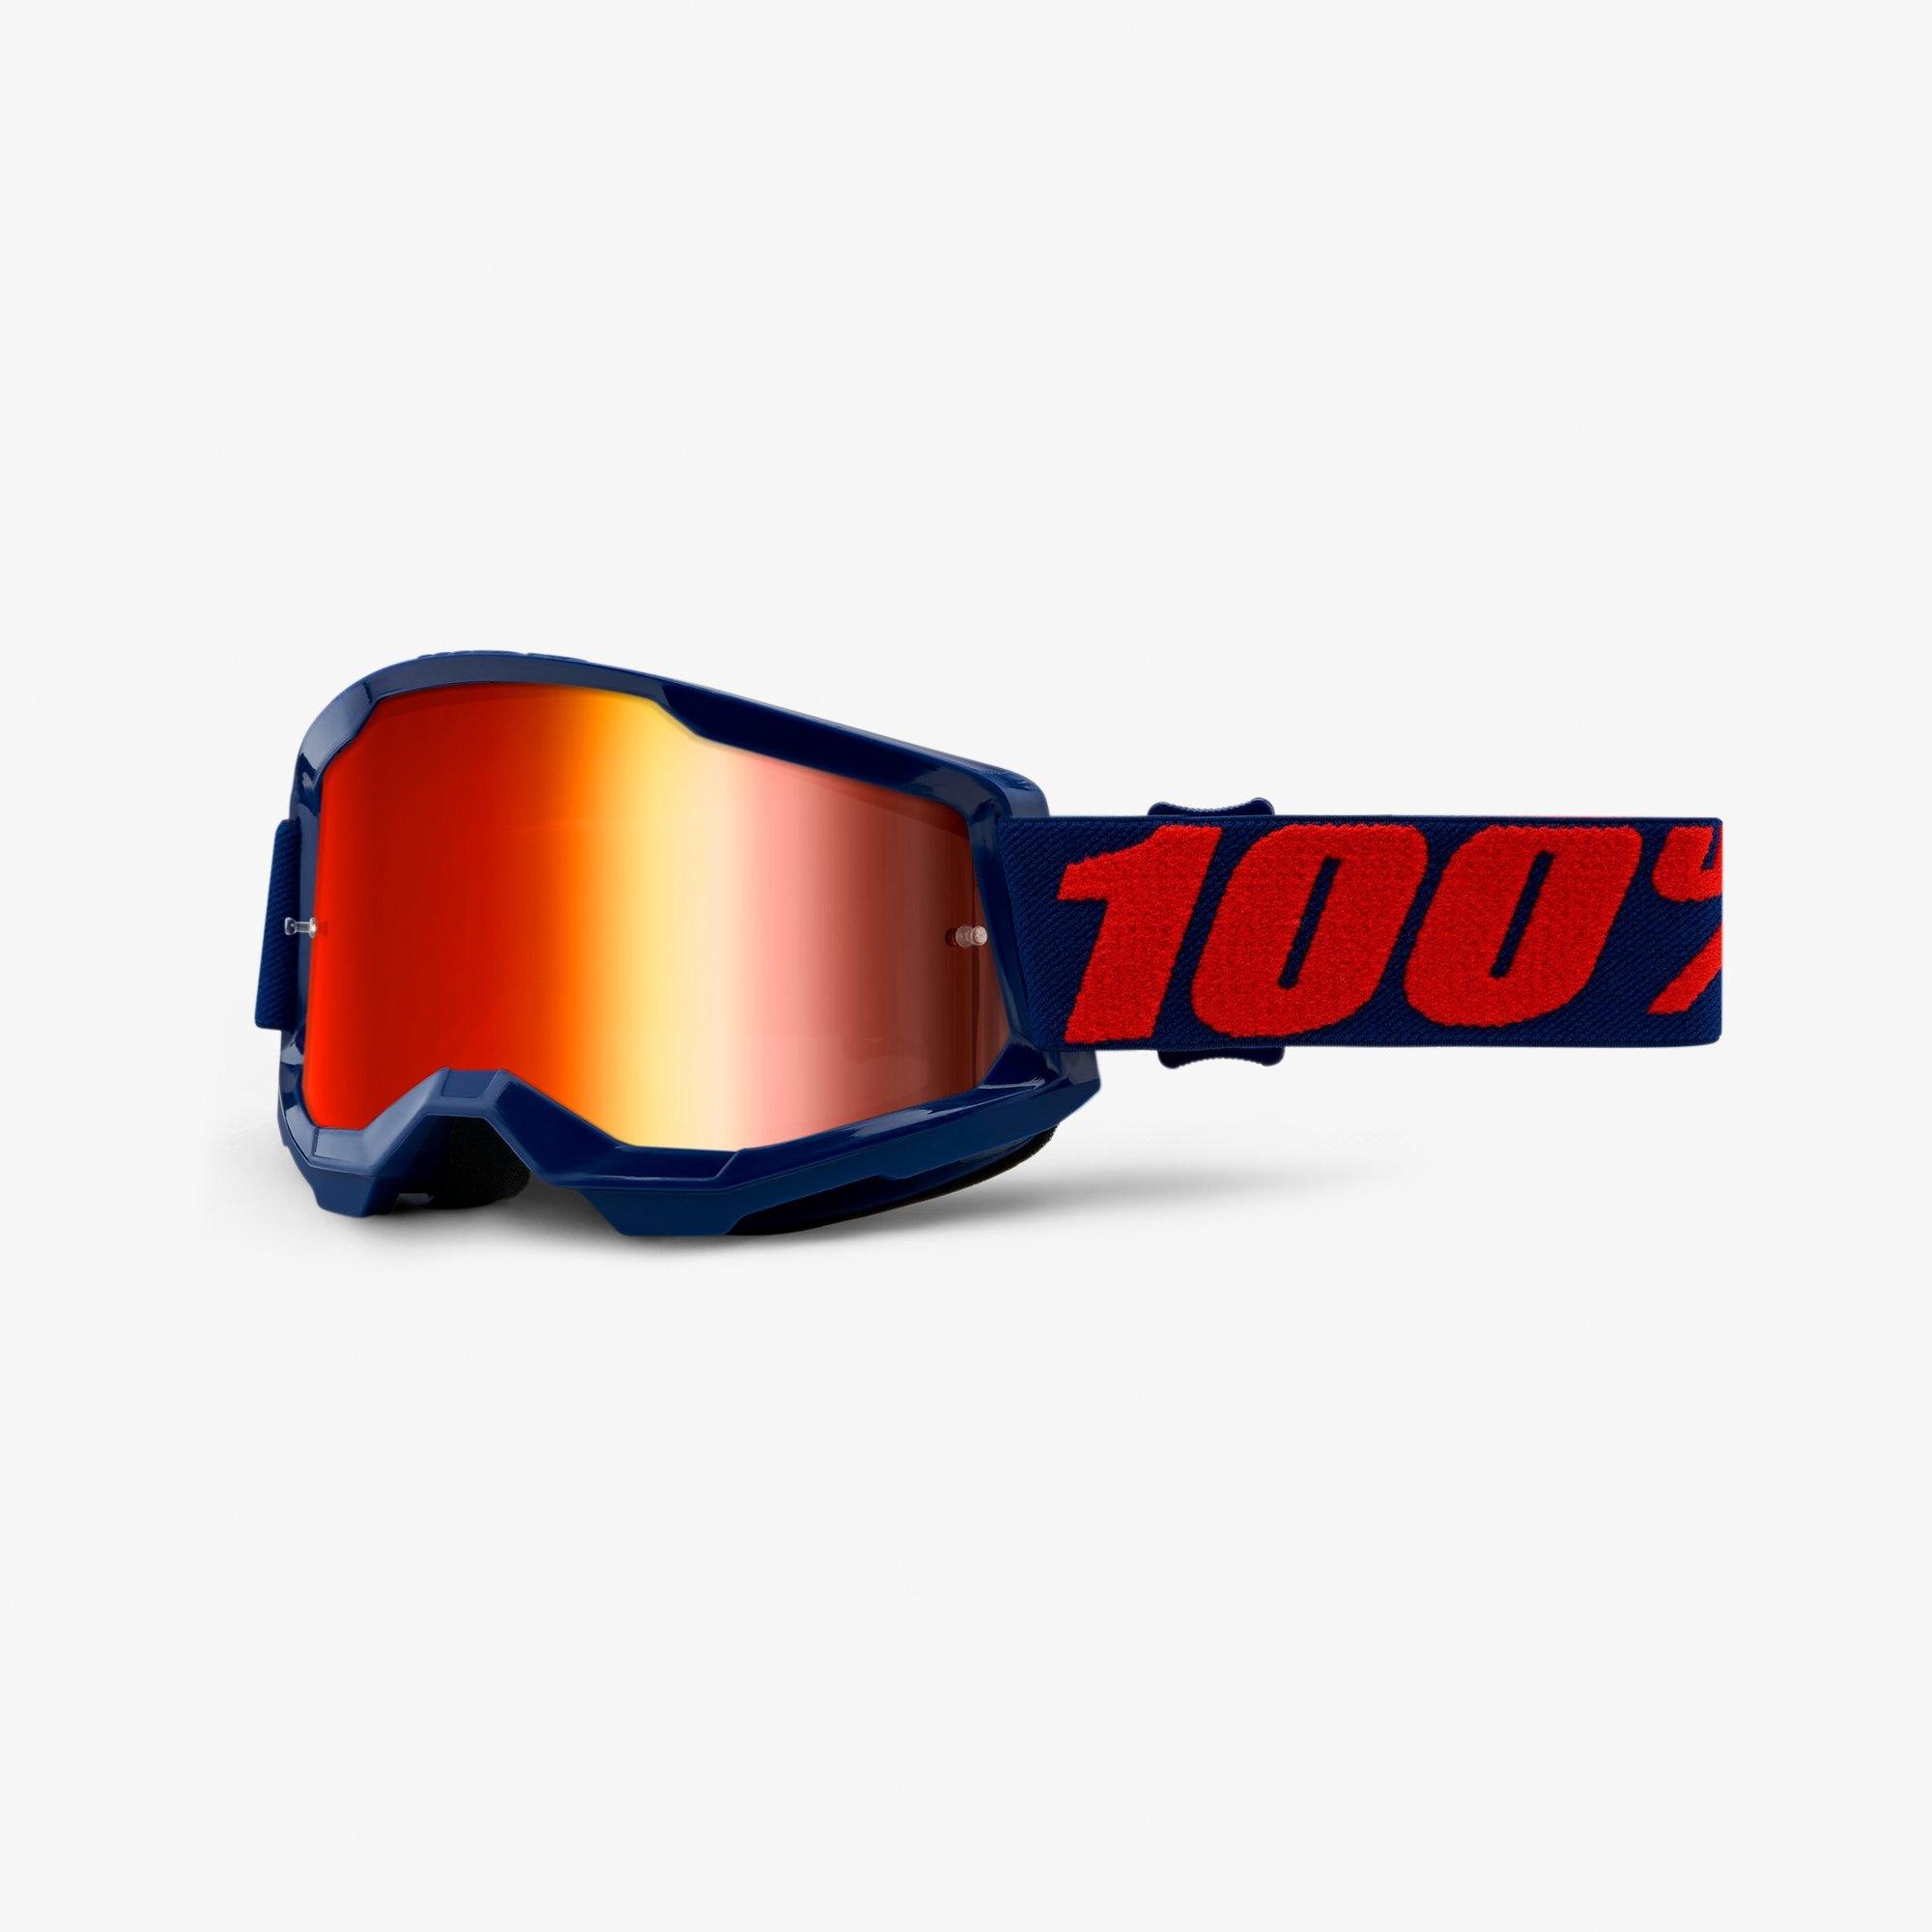 100% Strata 2 Goggles Mirror Lens-2